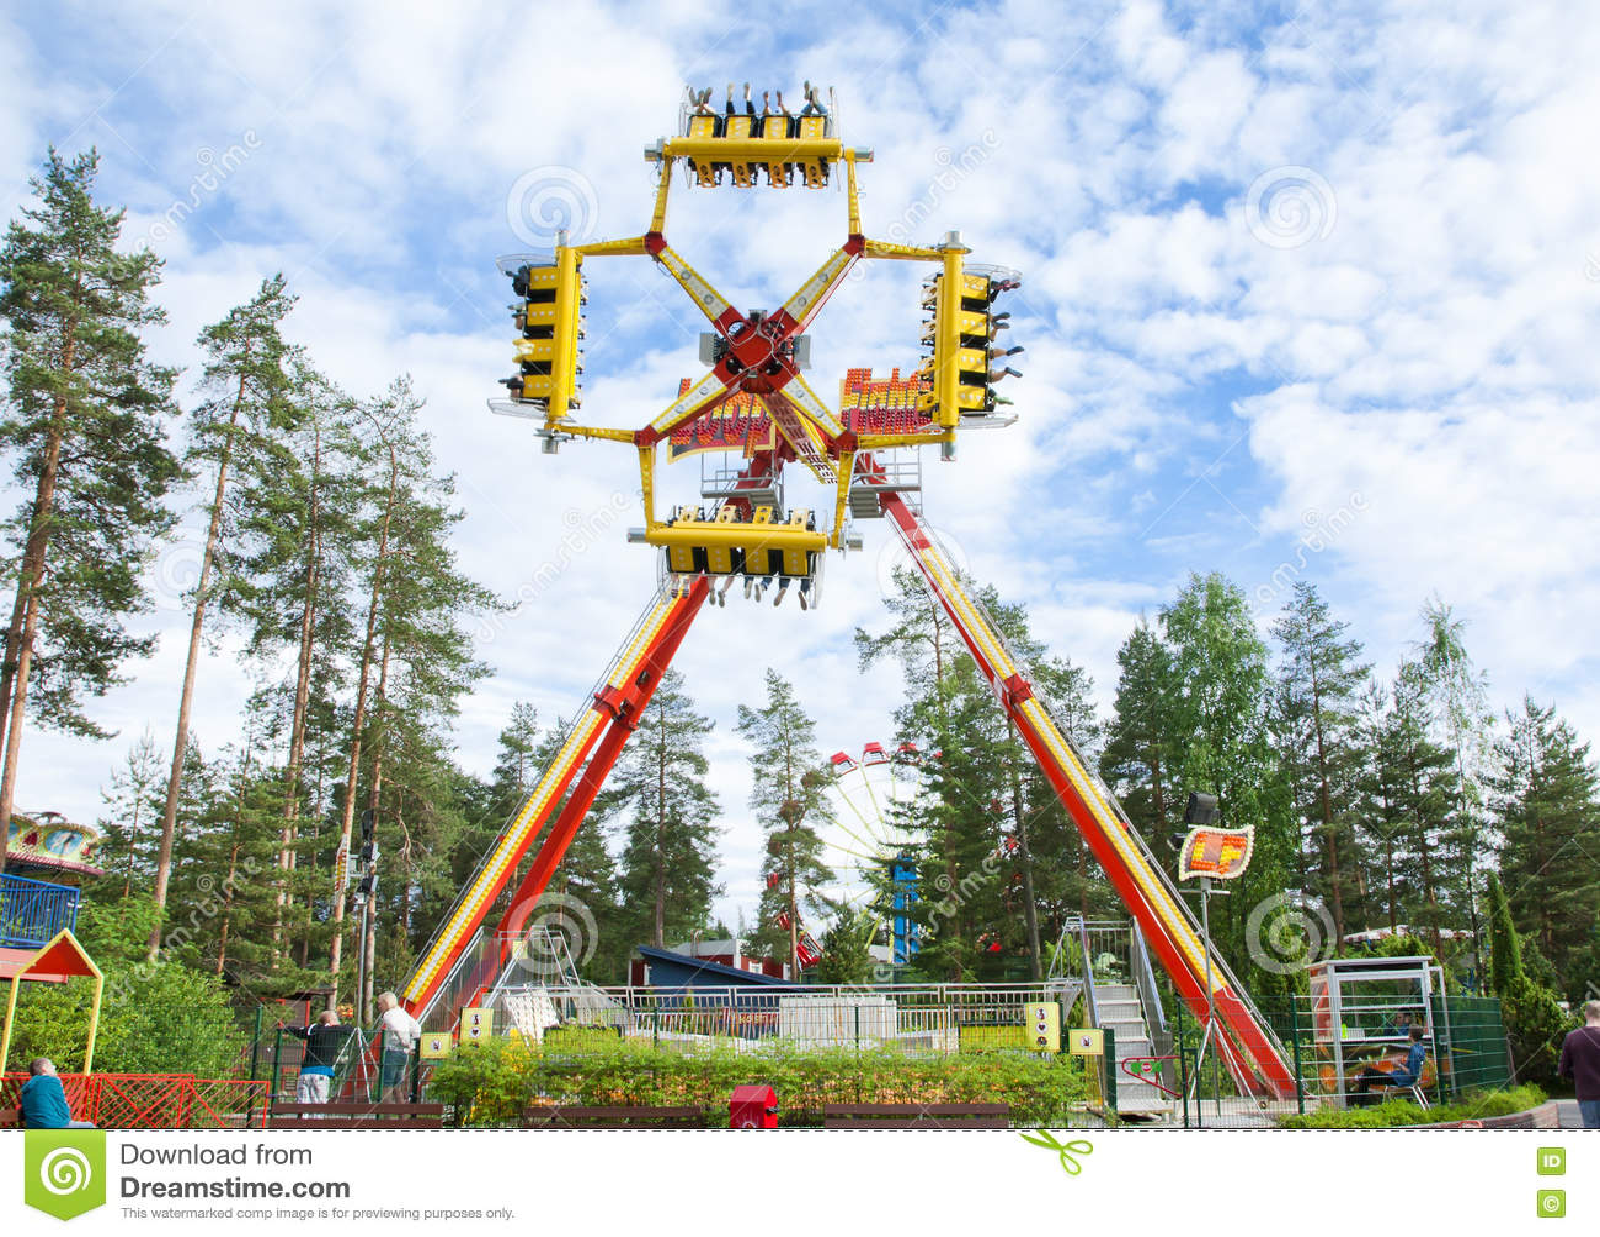 Kouvola Finland 7 Juni 2016 - rida öglaskämpen i rörelse i nöjesfältet Tykkimaki